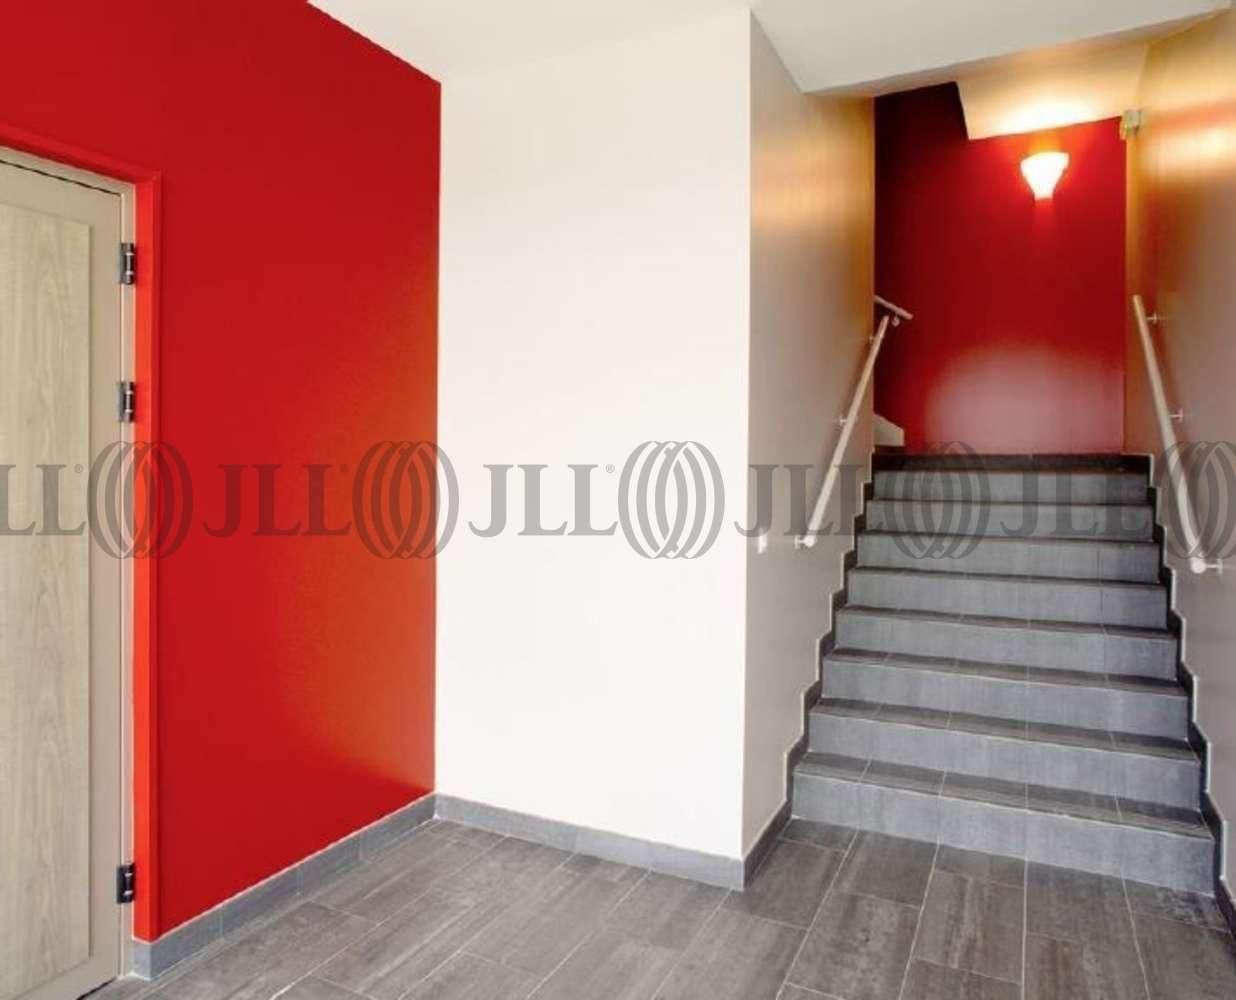 Activités/entrepôt Lieusaint, 77127 - PERIPARK BATIMENT 1 - 9445544